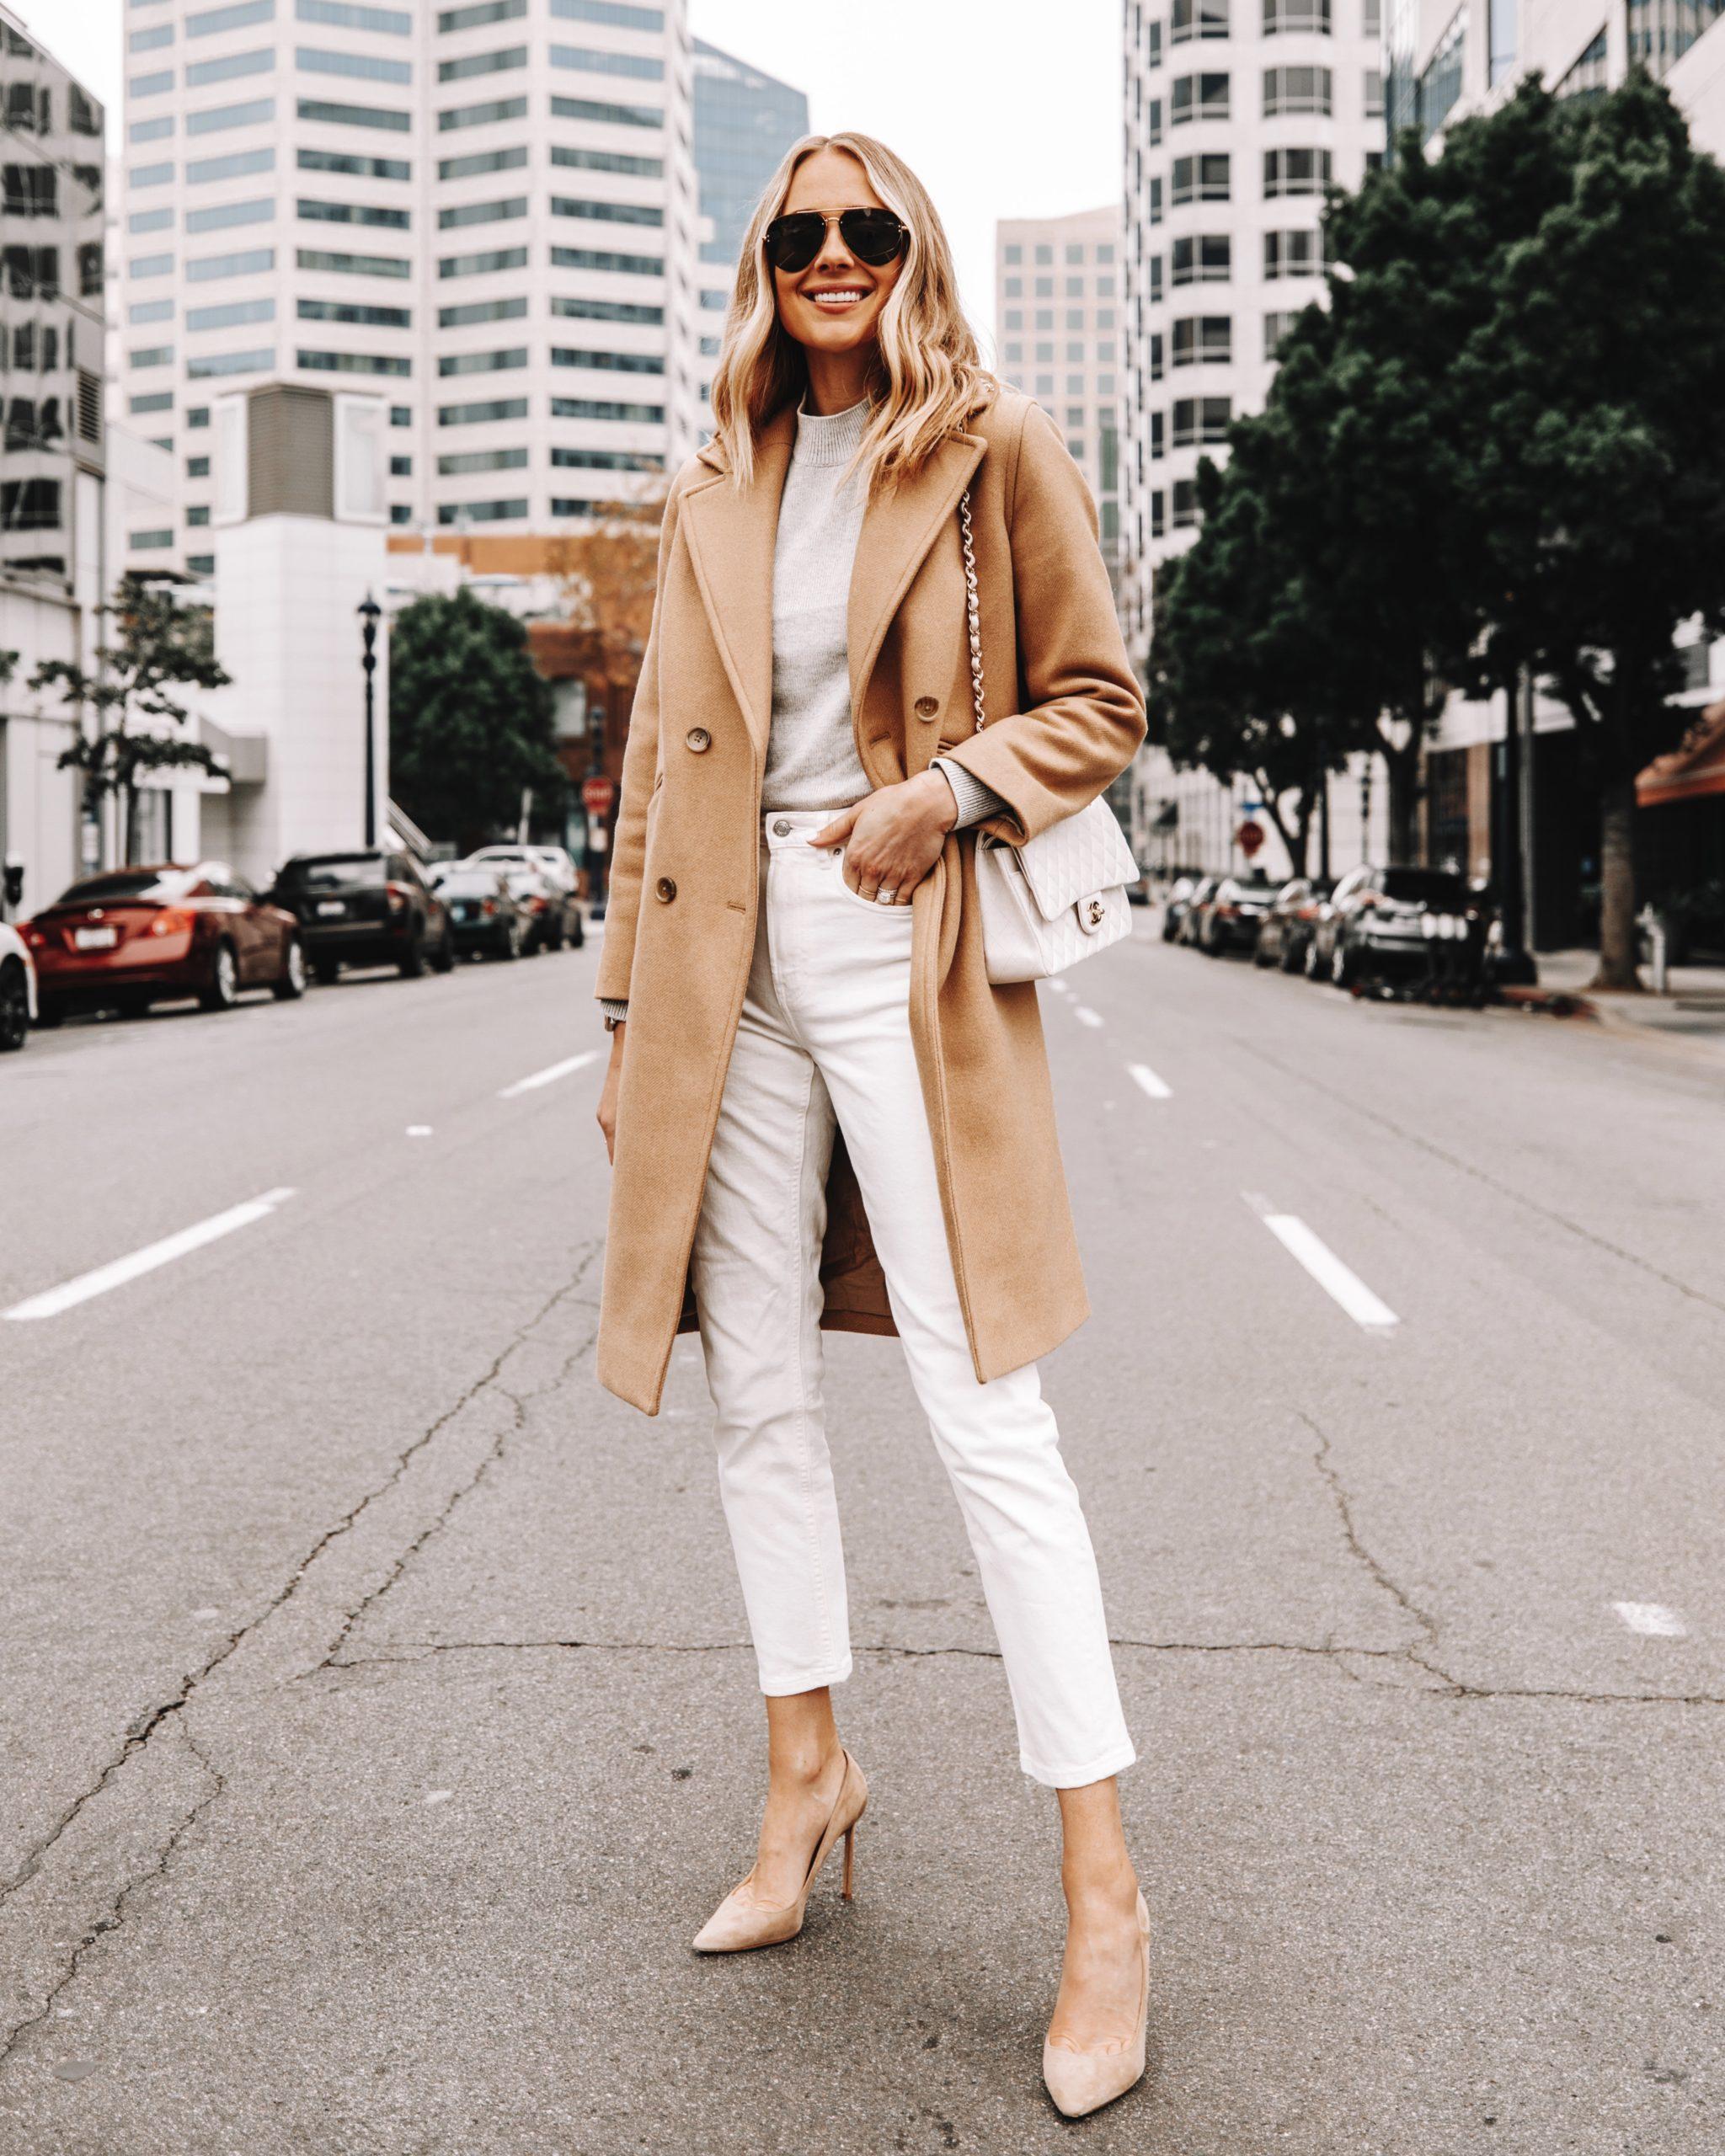 Fashion Jackson Wearing Camel Coat White Jeans Tan Pumps